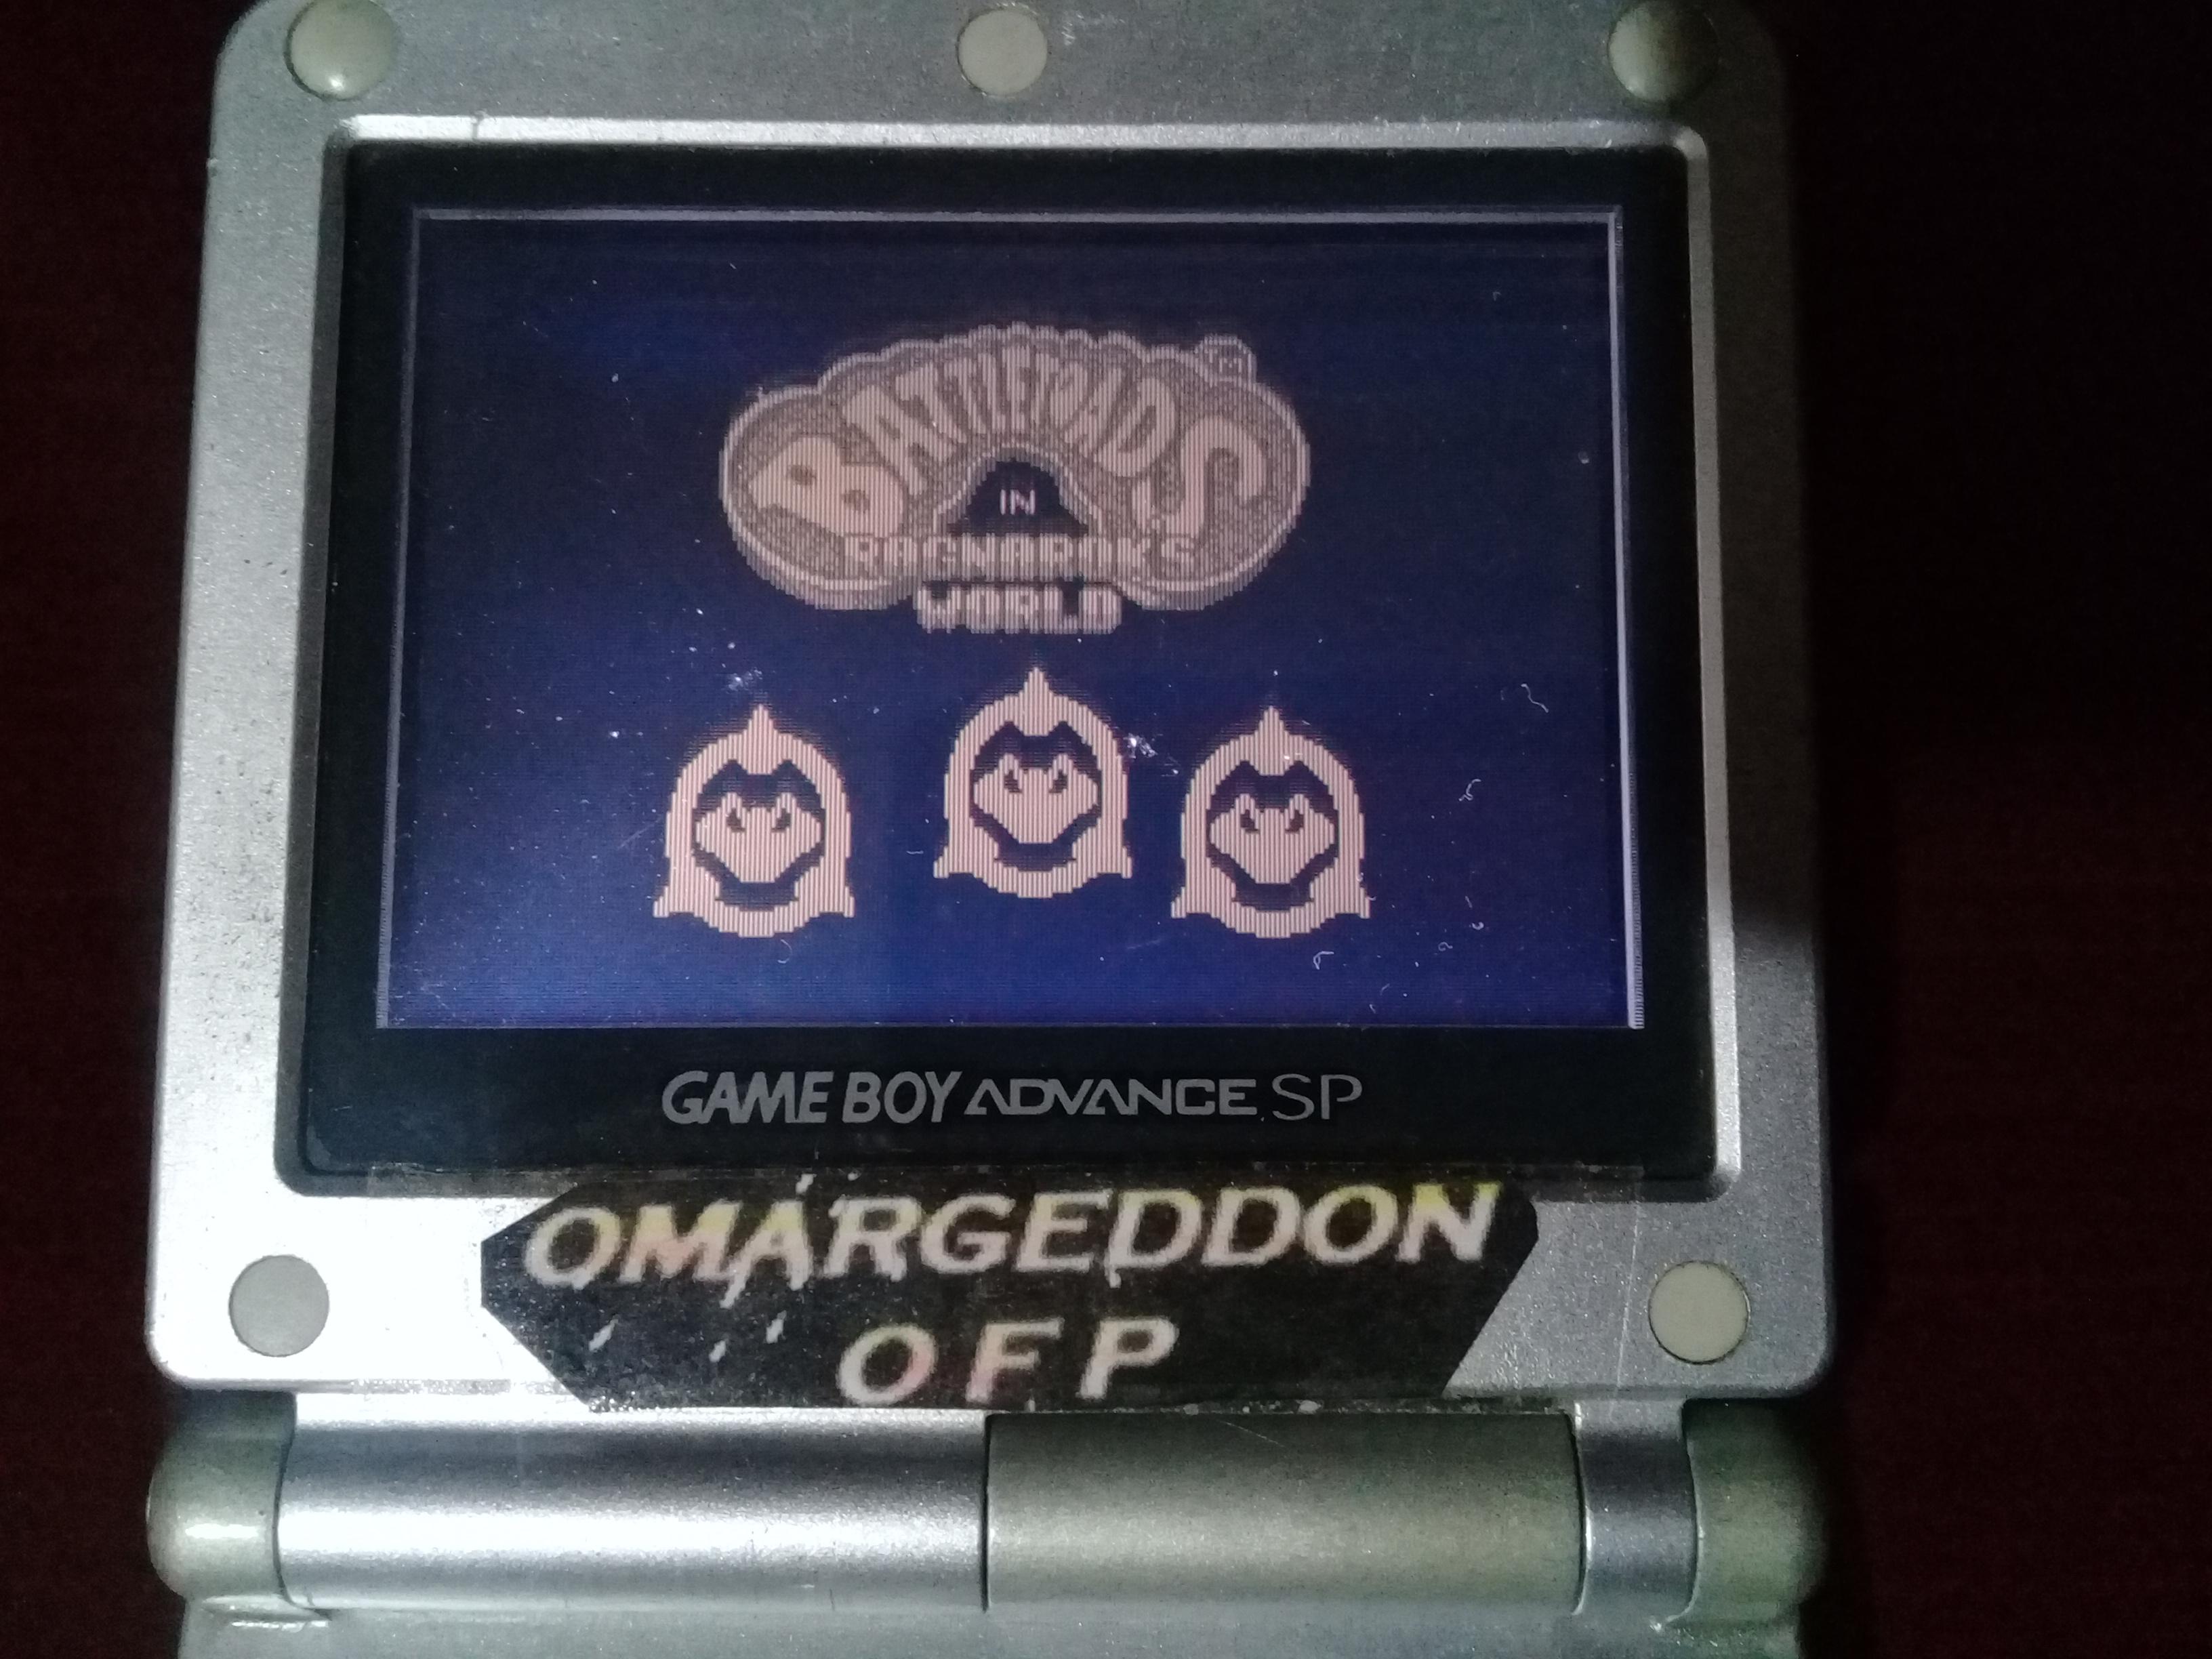 omargeddon: Battletoads In Ragnarok